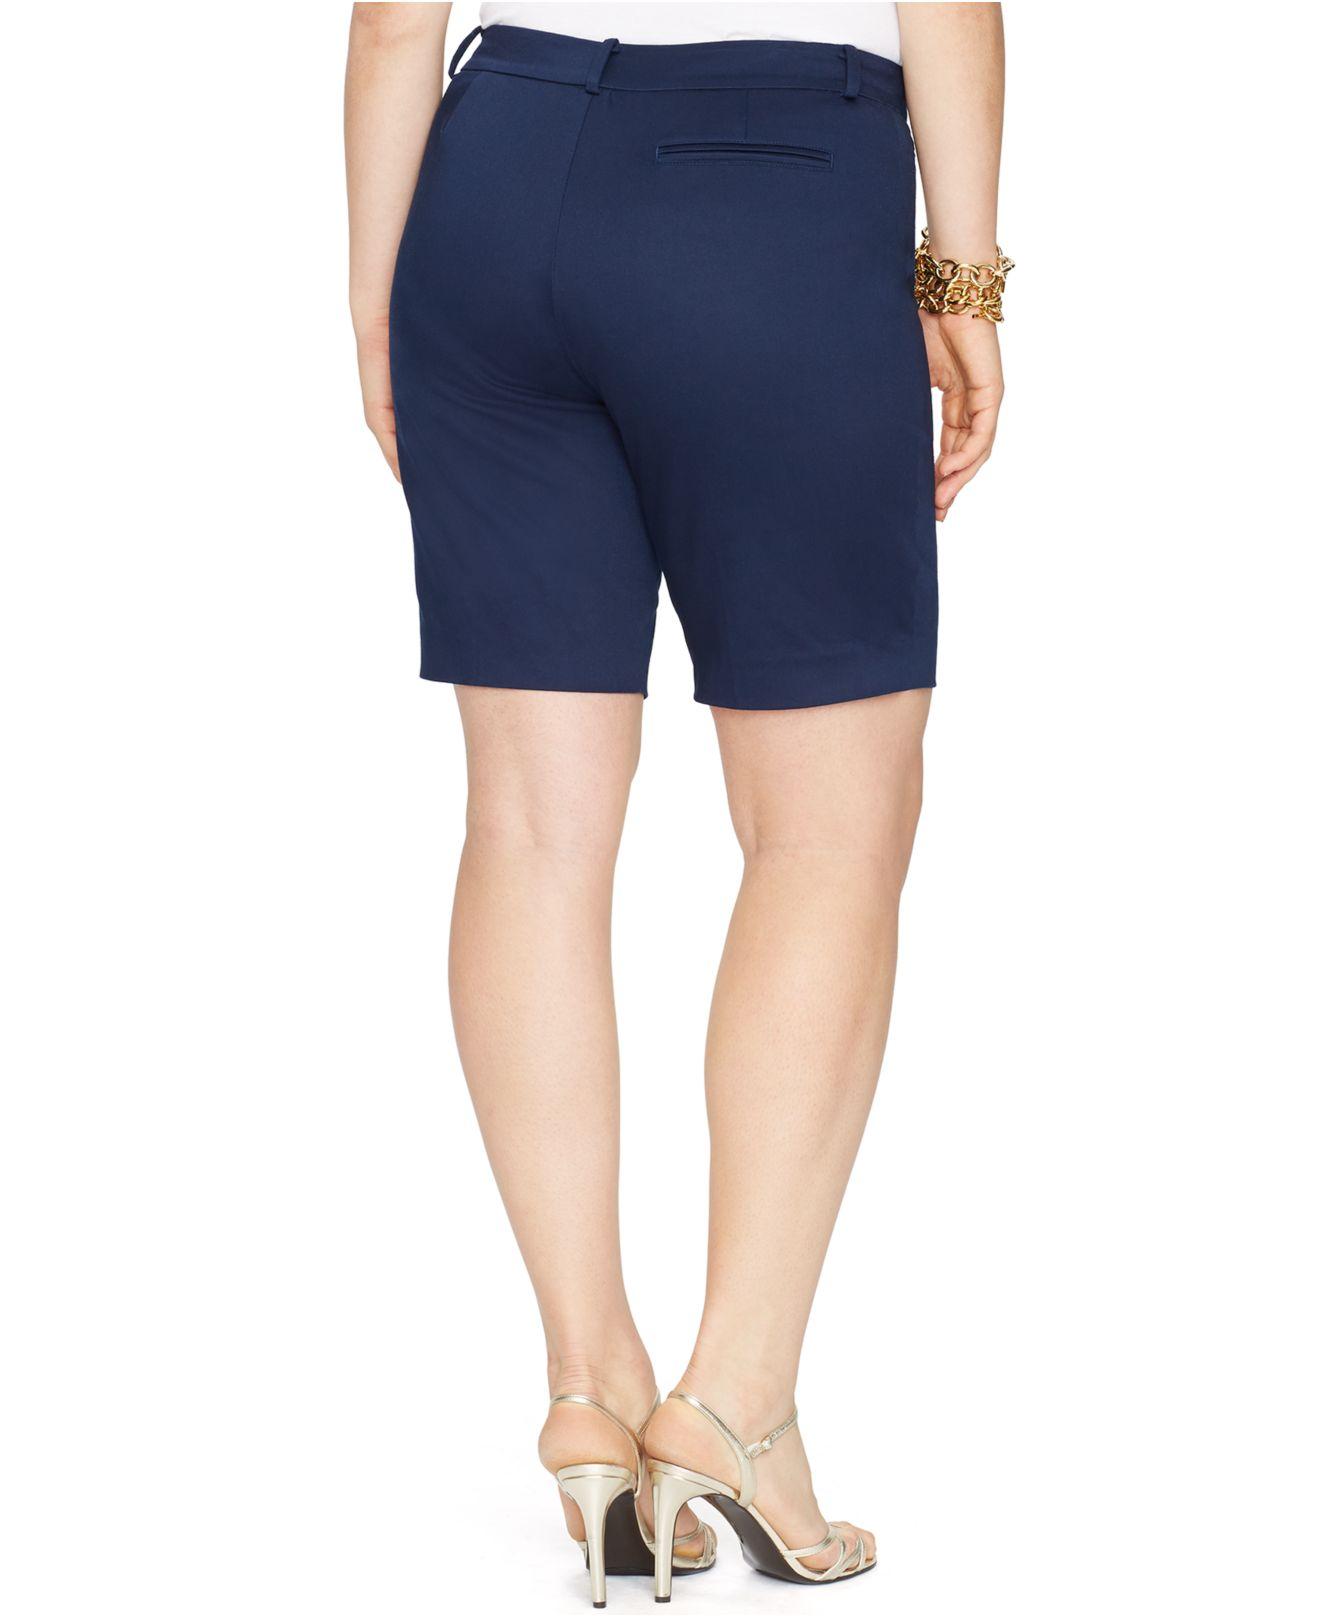 c10a08b033 Lyst - Lauren by Ralph Lauren Plus Size Sateen Shorts in Blue